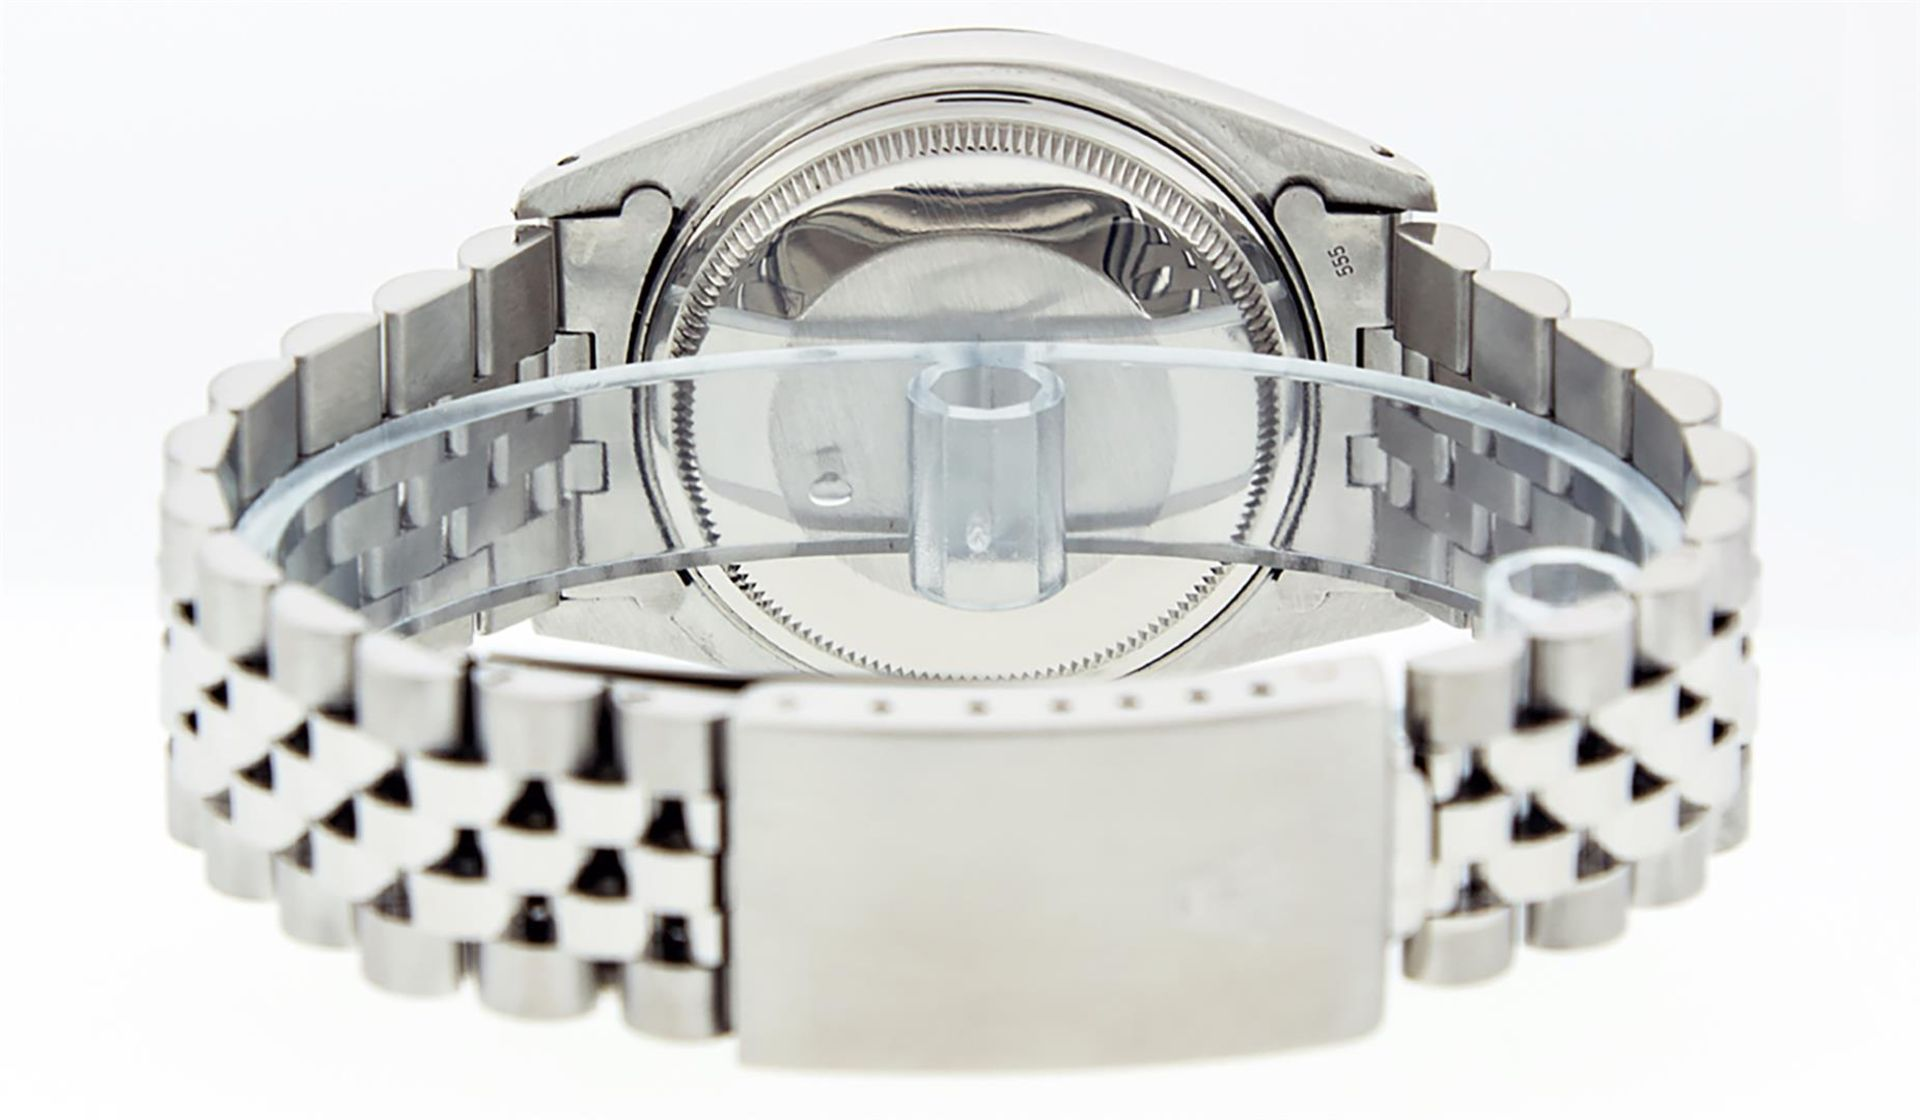 Rolex Mens Stainless Steel 36MM Blue Diamond Datejust Wristwatch - Image 8 of 9